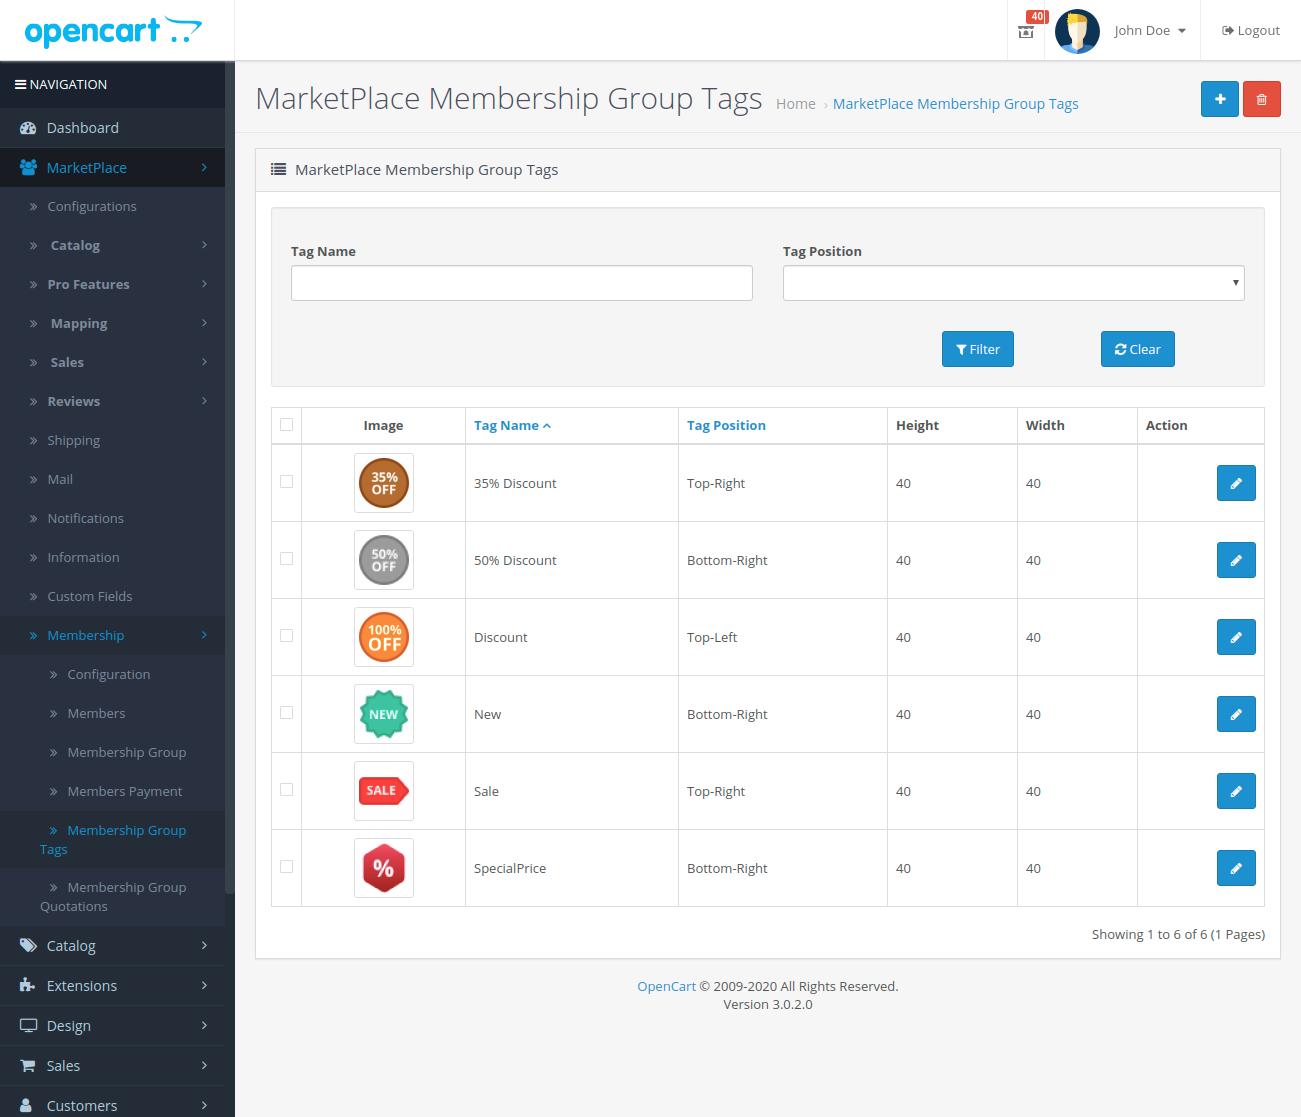 MarketPlace-Membership-Group-Tags